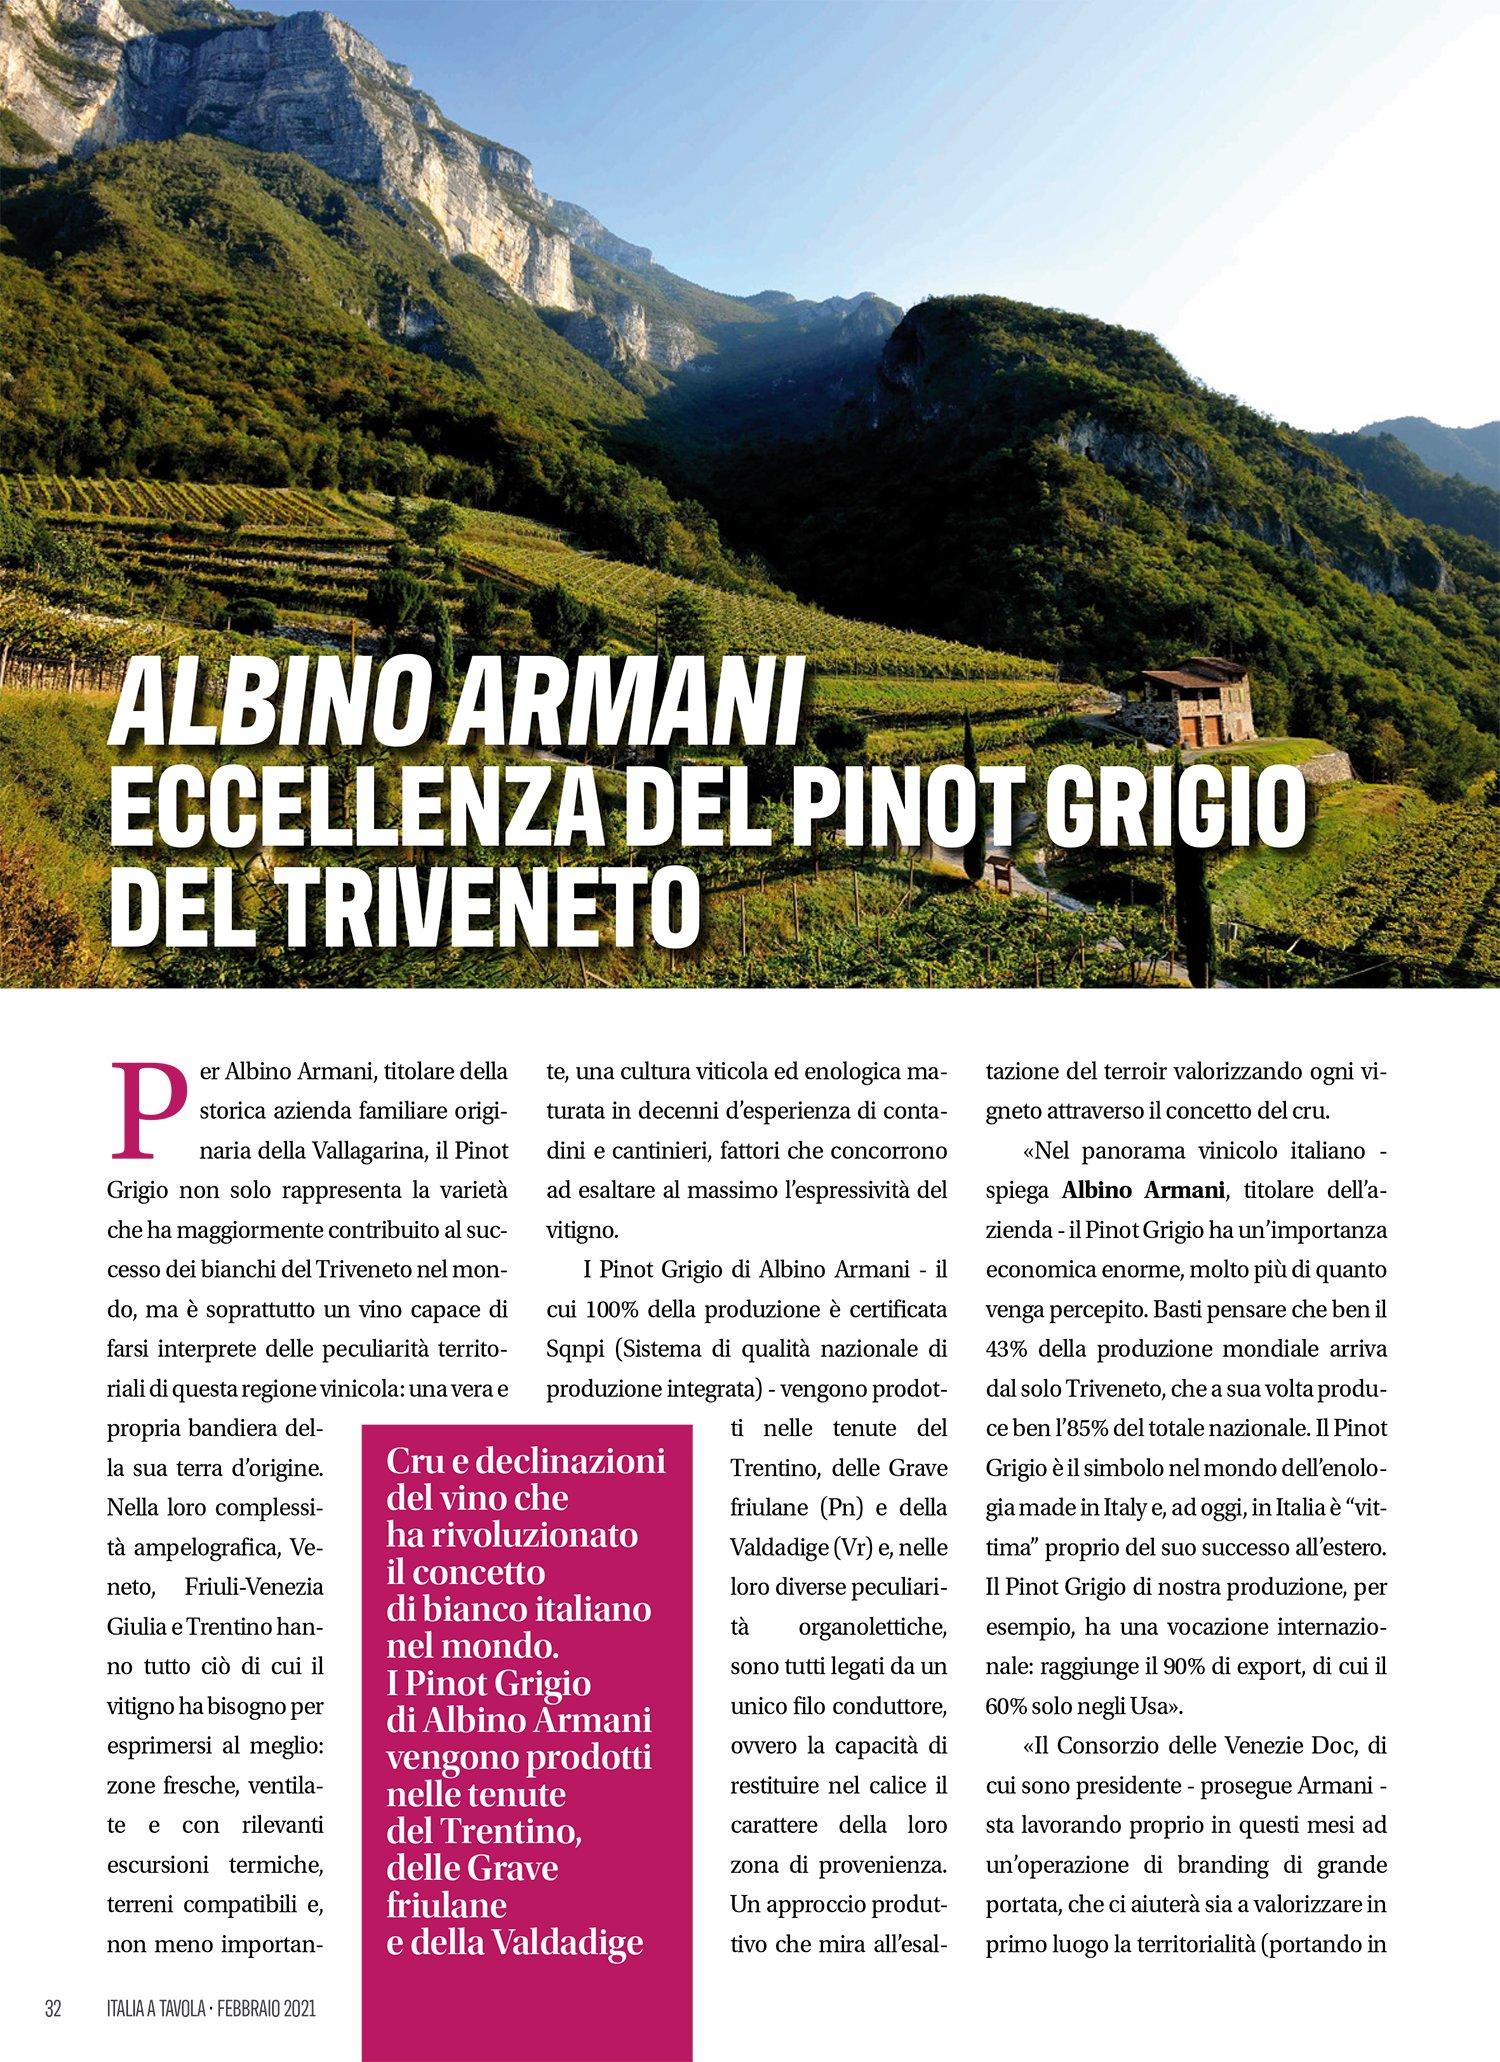 Pinot Grigio Italia a Tavola Febbraio 2021 Albino Armani pag 1